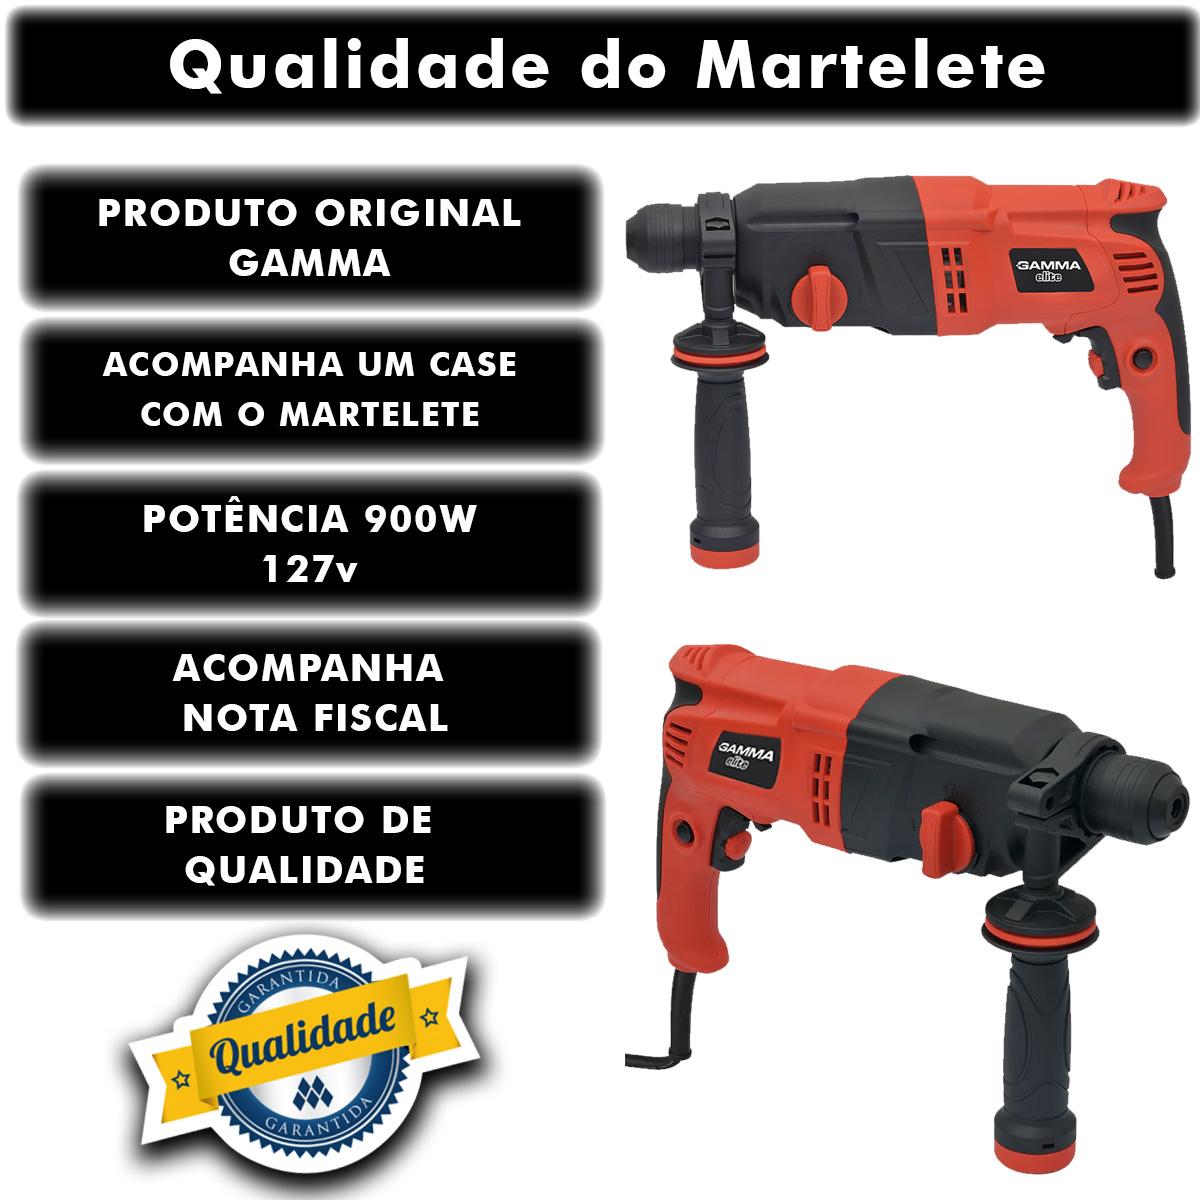 Martelete Gamma Elite 900w Rotativo Rompedor Perfurador 127v Poliparts